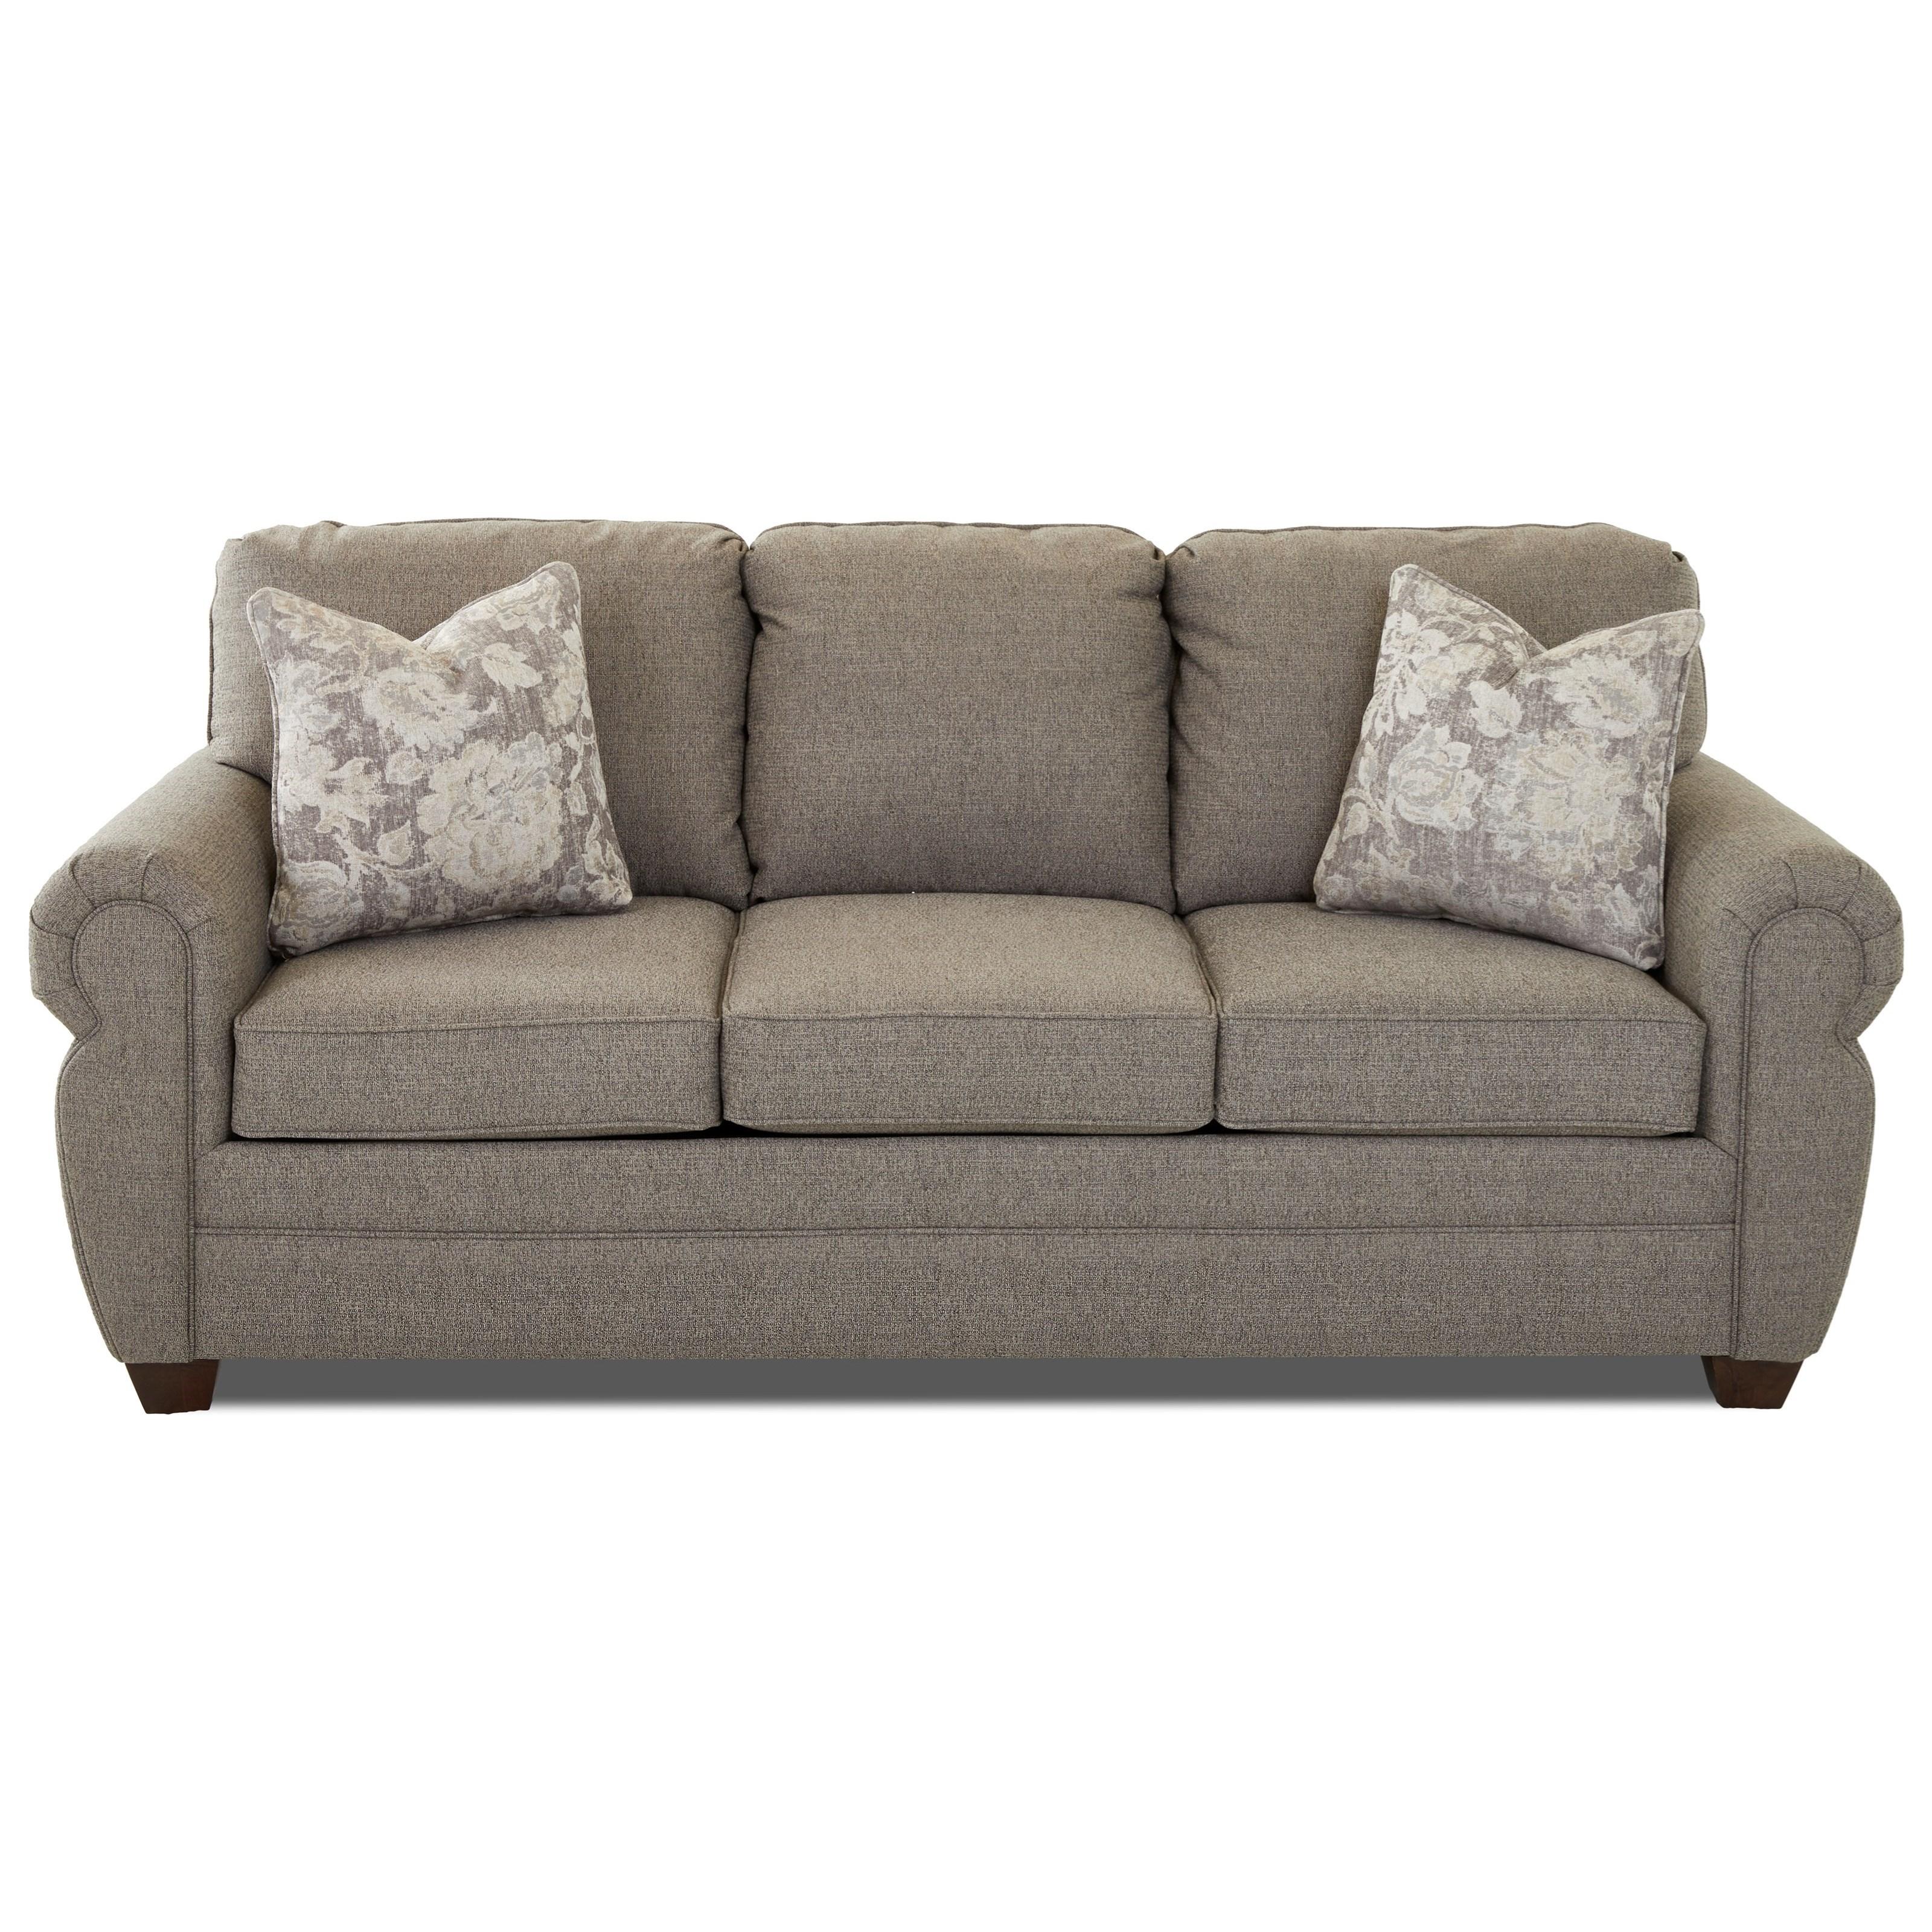 Westbrook Sleeper Sofa w/ Innerspring Mattress by Klaussner at Johnny Janosik